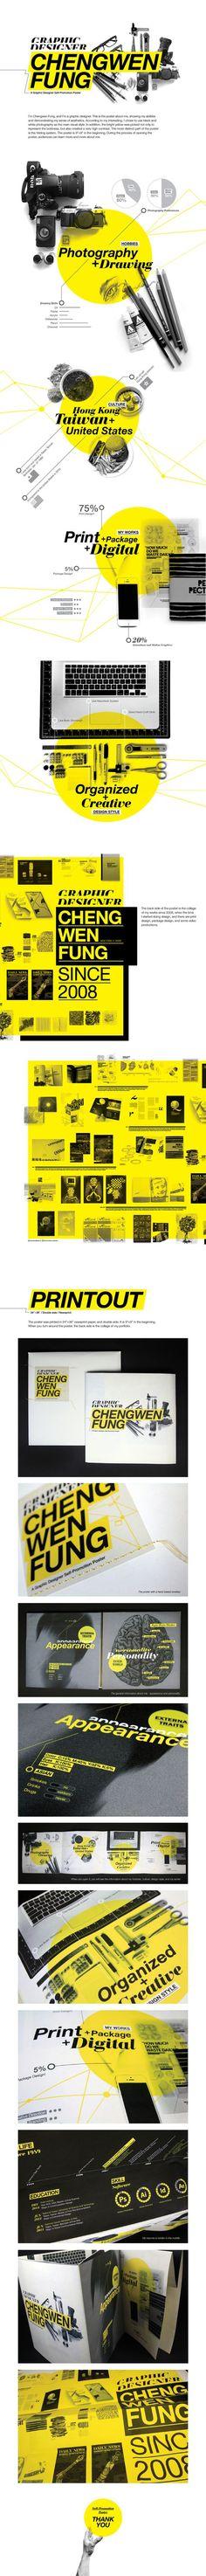 Photography Website Design: